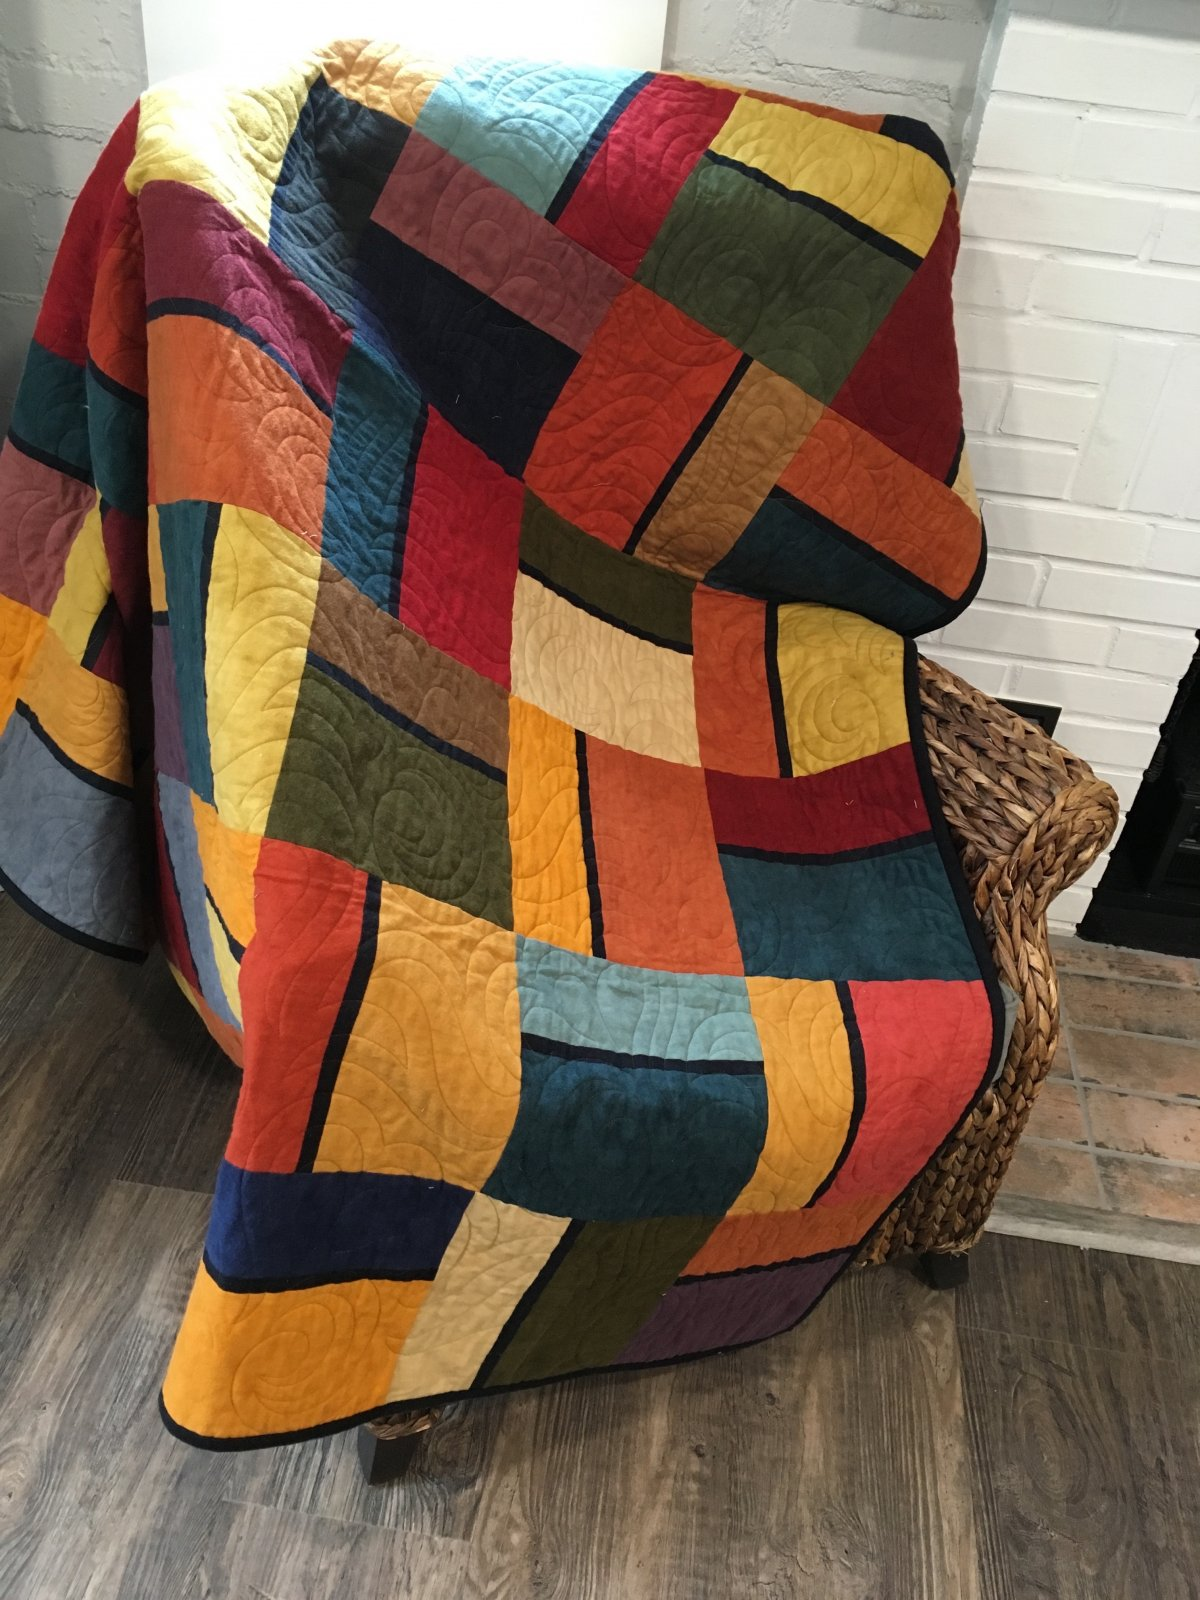 Color Block Pattern - Magnolia Quilt Company -